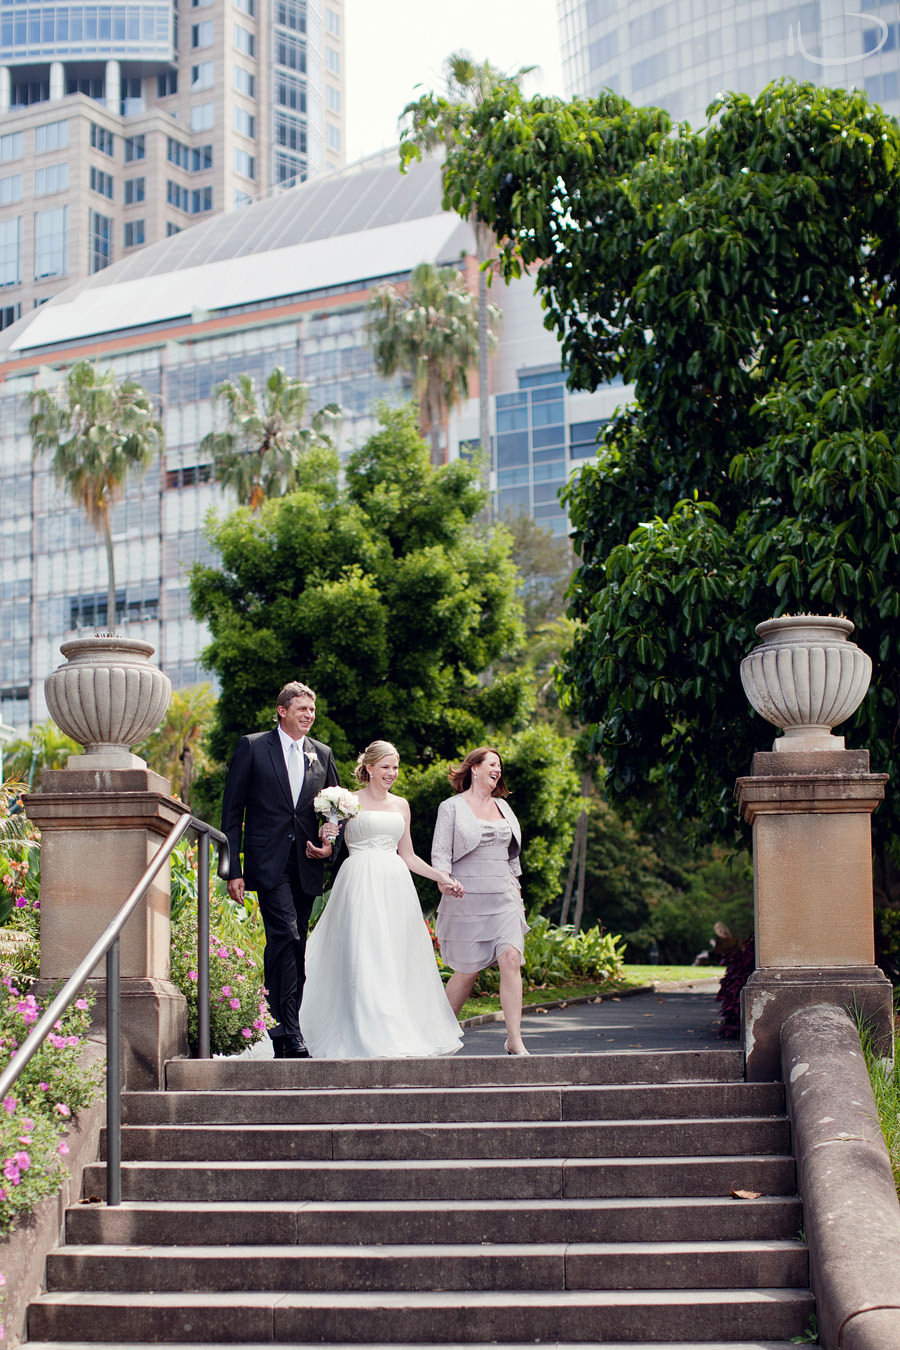 Botanic Gardens Wedding Photographer: